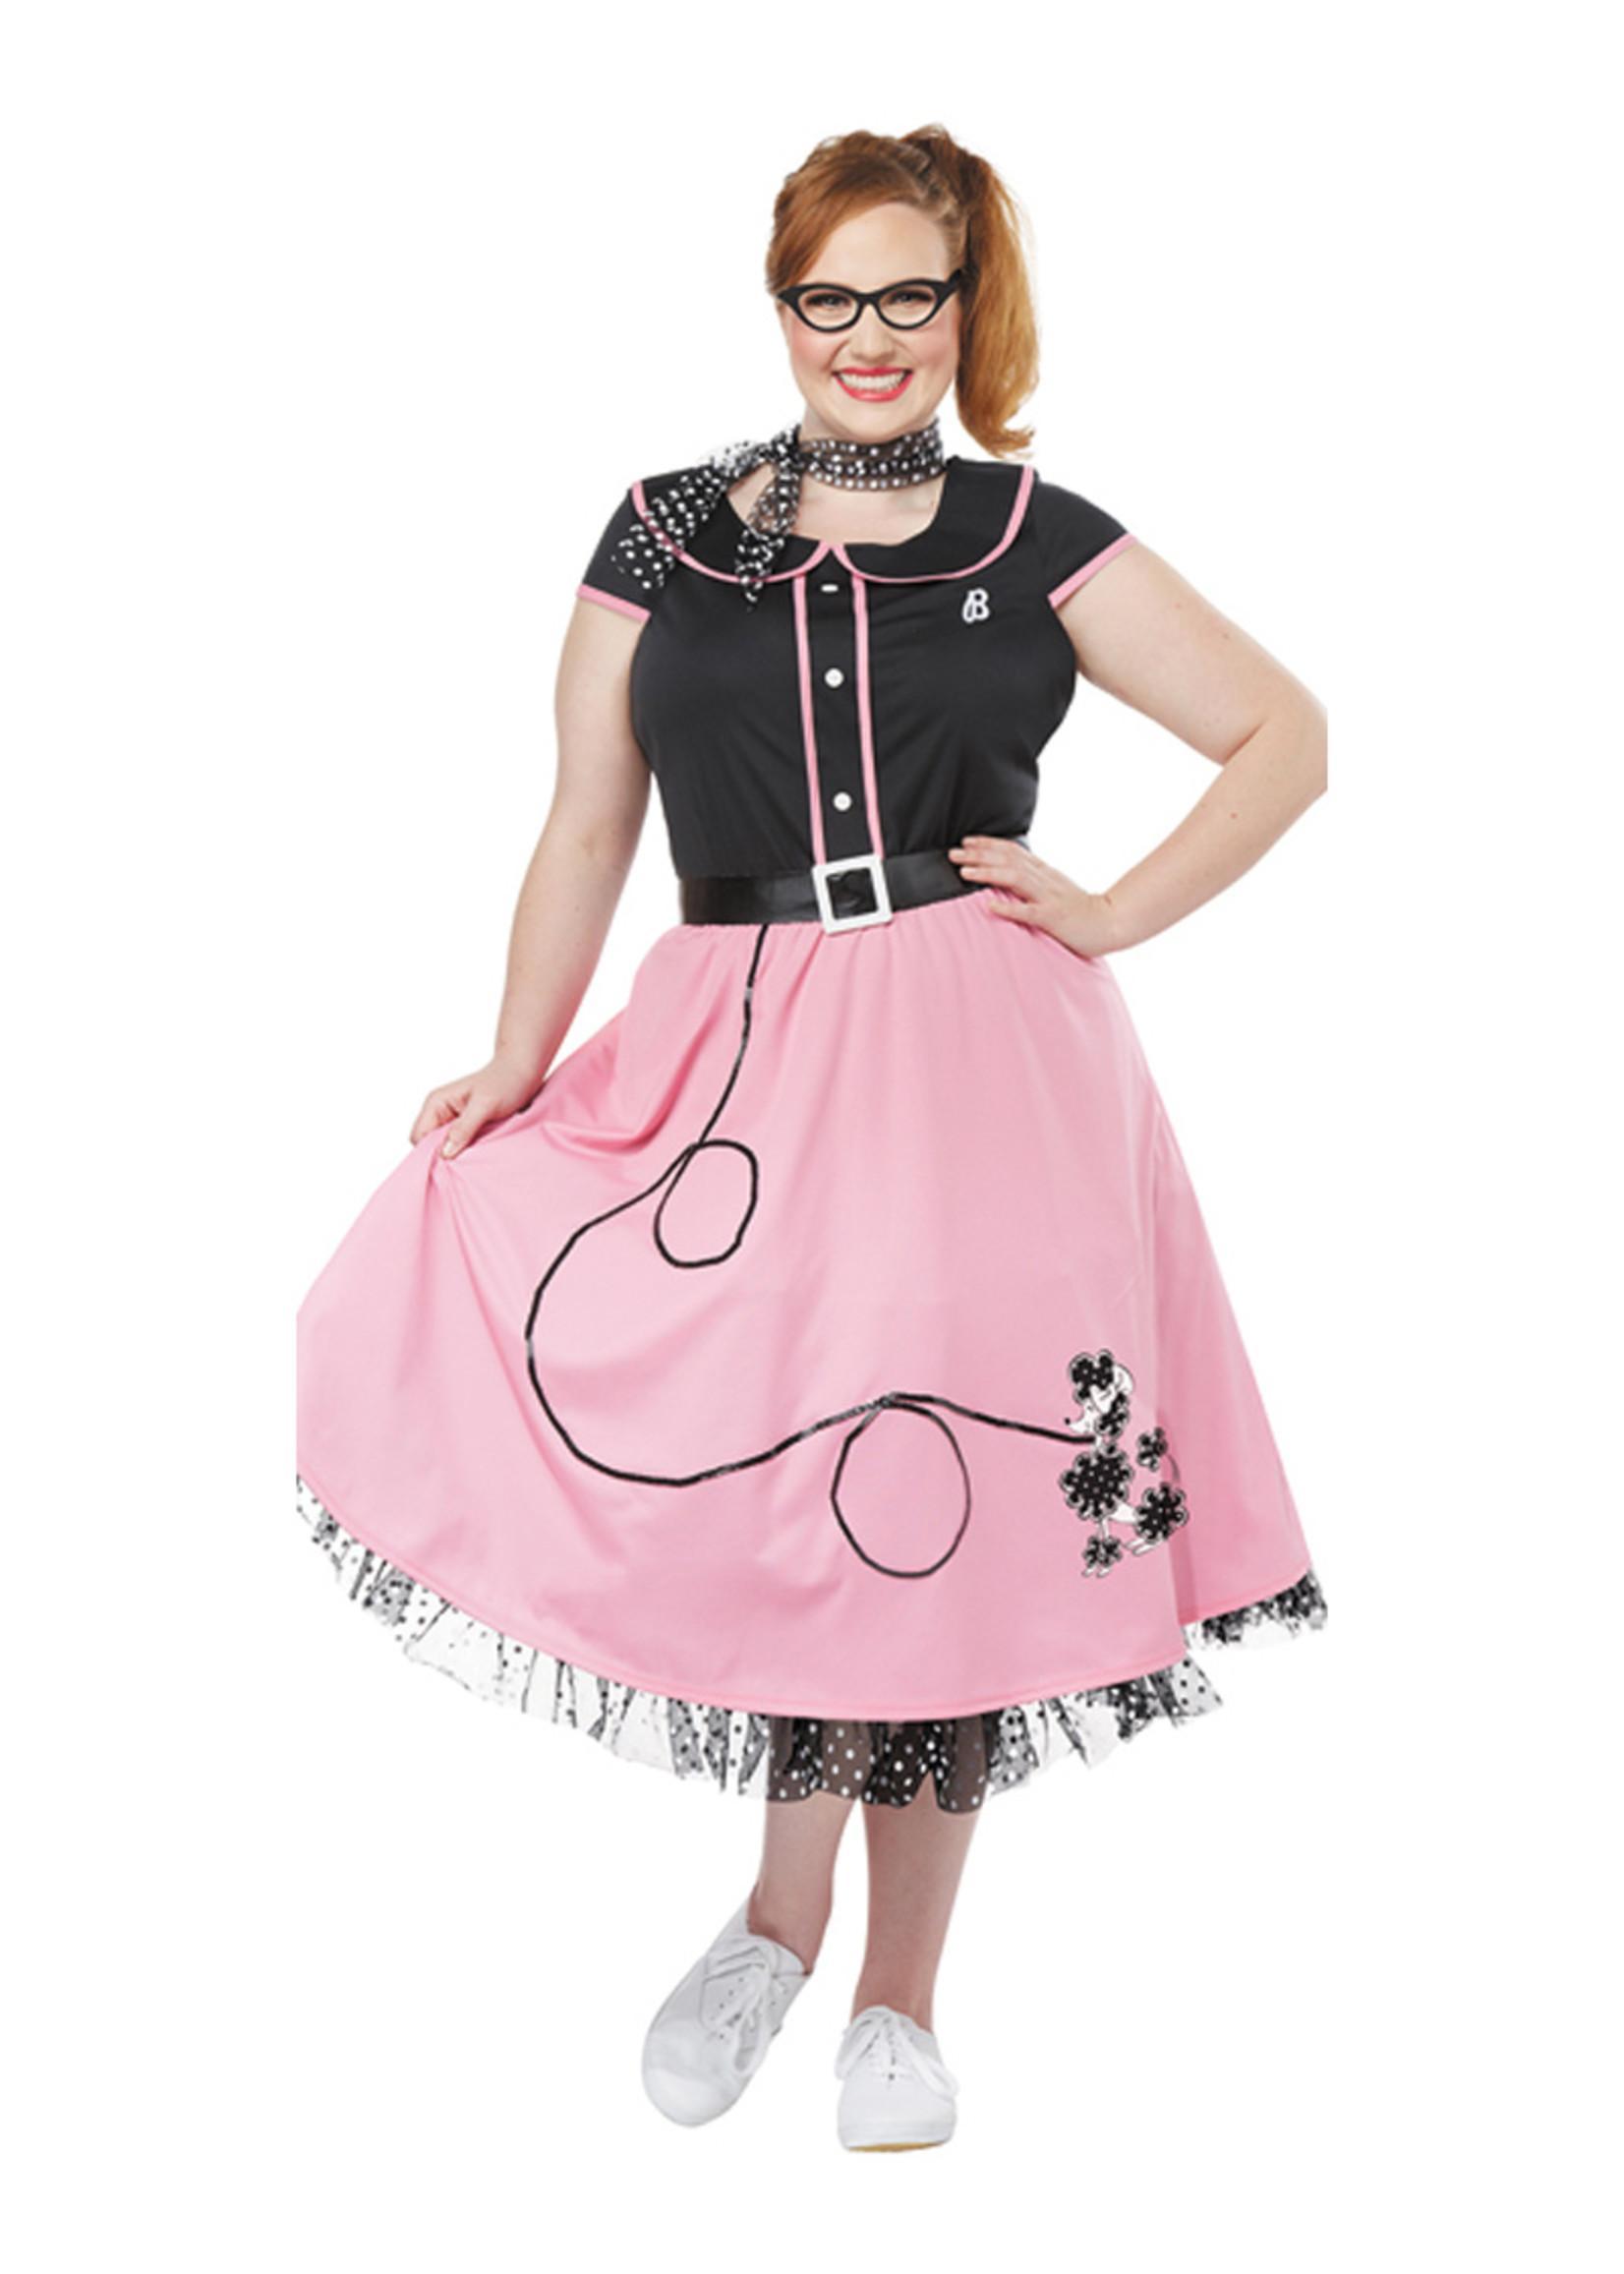 50's Sweetheart Costume - Women Plus